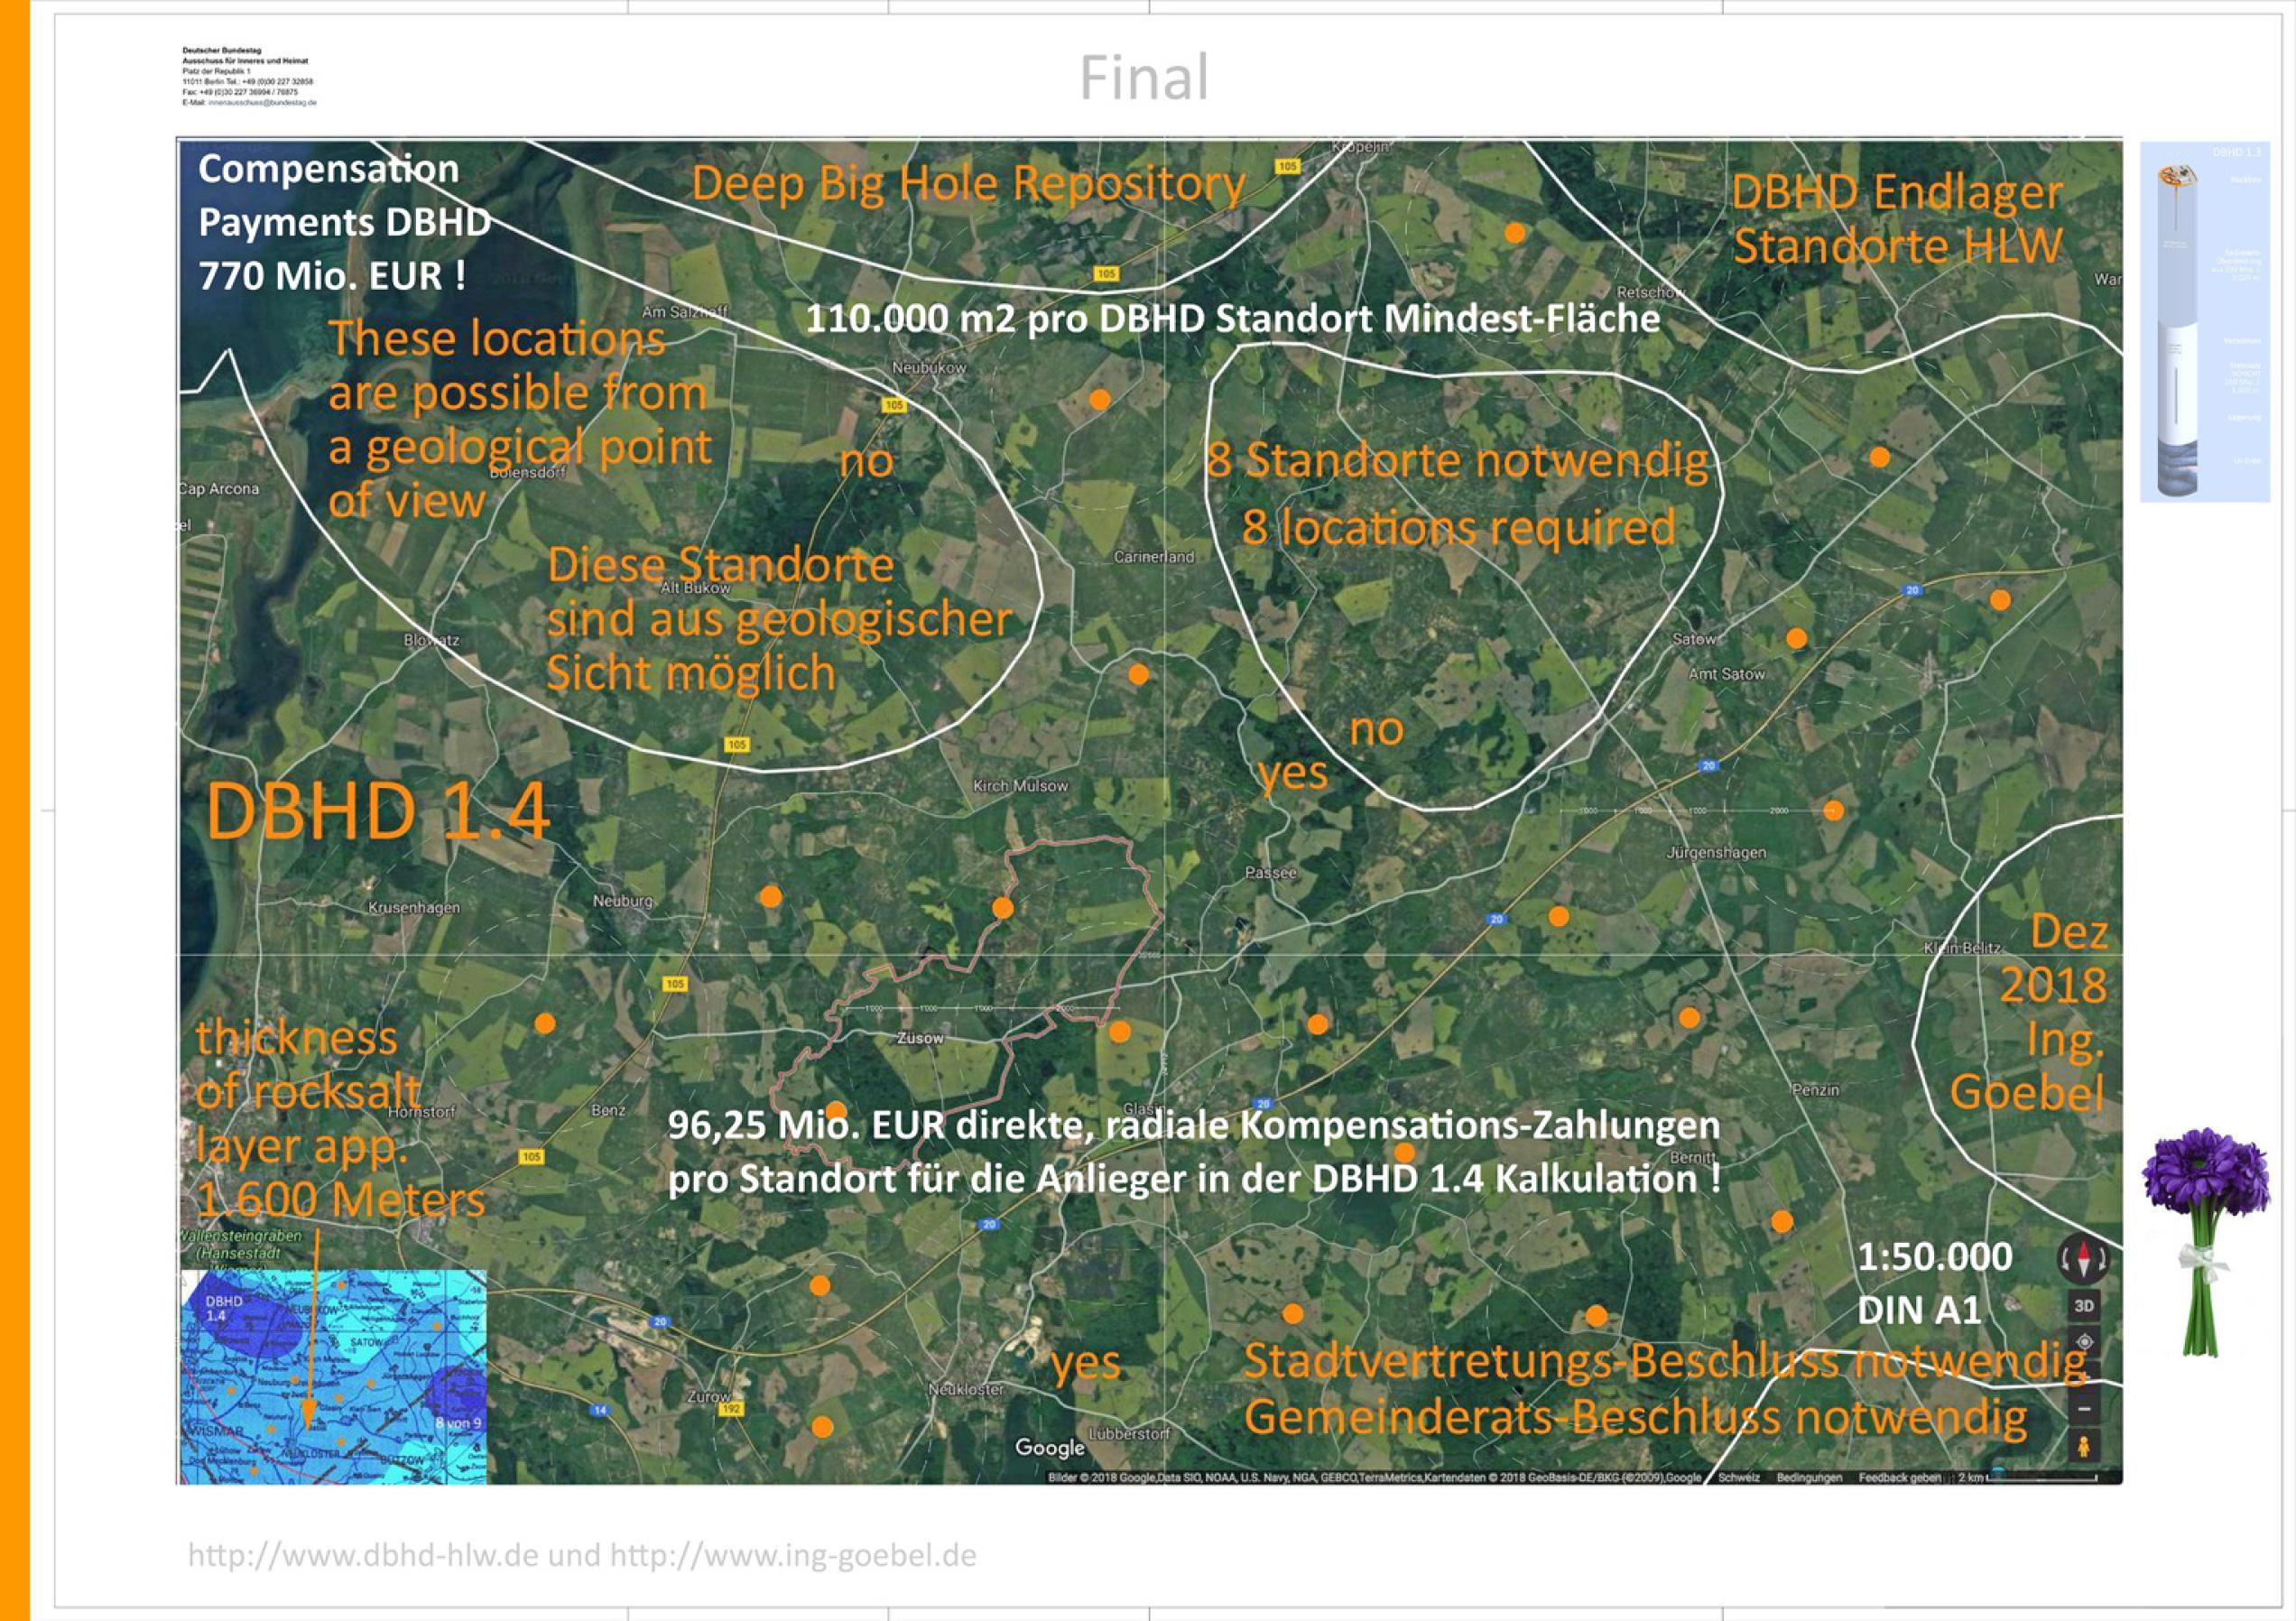 DBHD_1.3_Endlager_Standorte_Kompensationsradien_Karte_ing_Goebel_Basis_Geologische_Karte_auf_Satellitenbild Volker Goebel Endlager